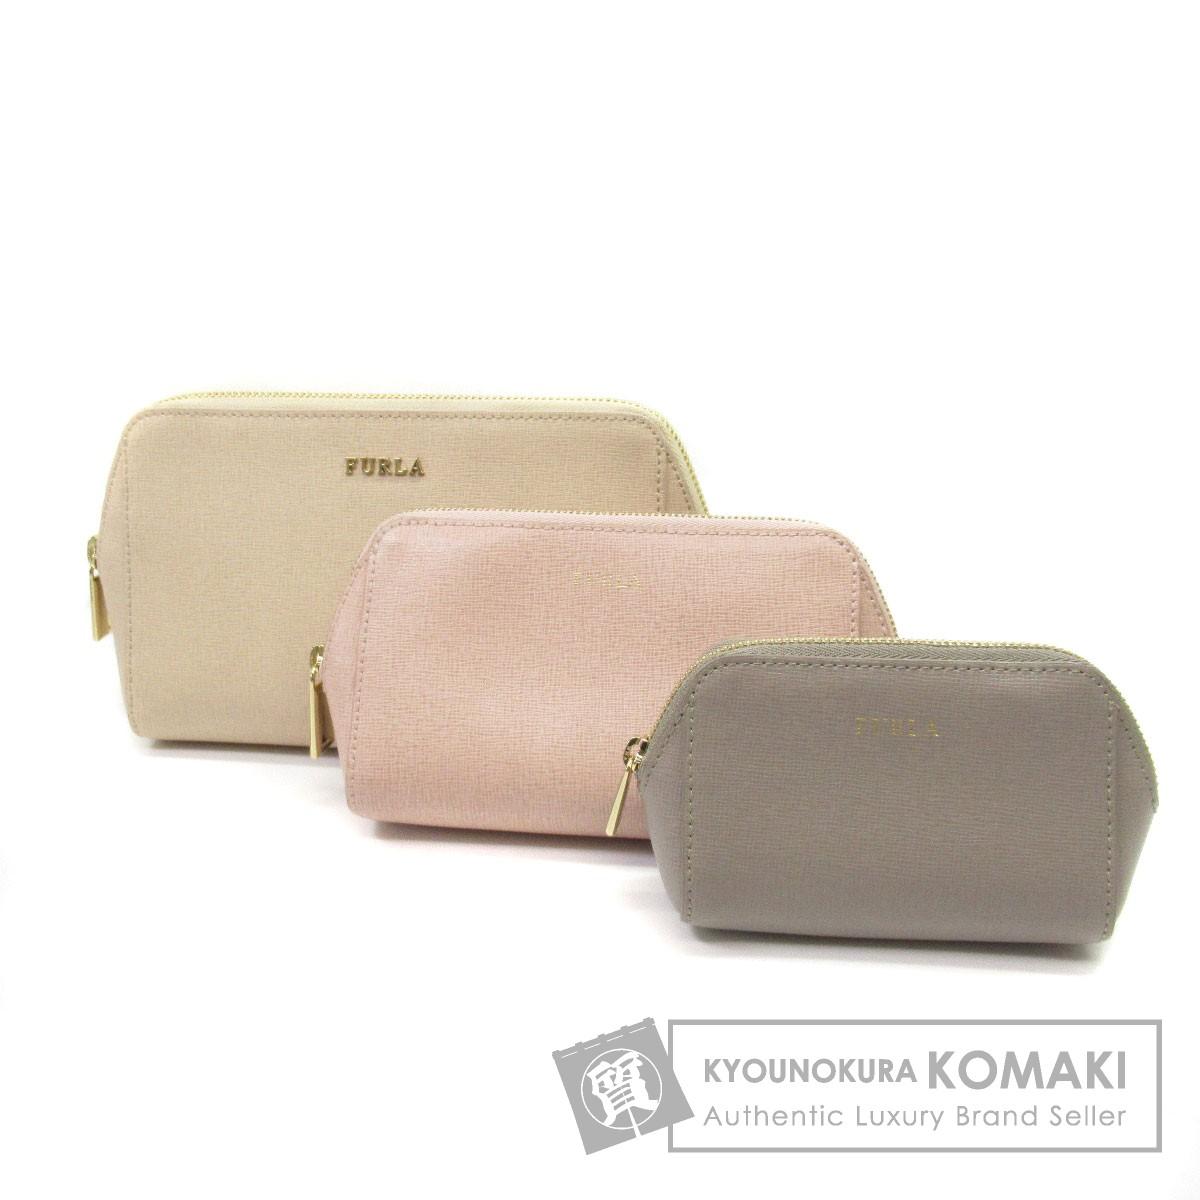 Furla ロゴマーク 3点セット 化粧ポーチ PVC レディース 【中古】【フルラ】